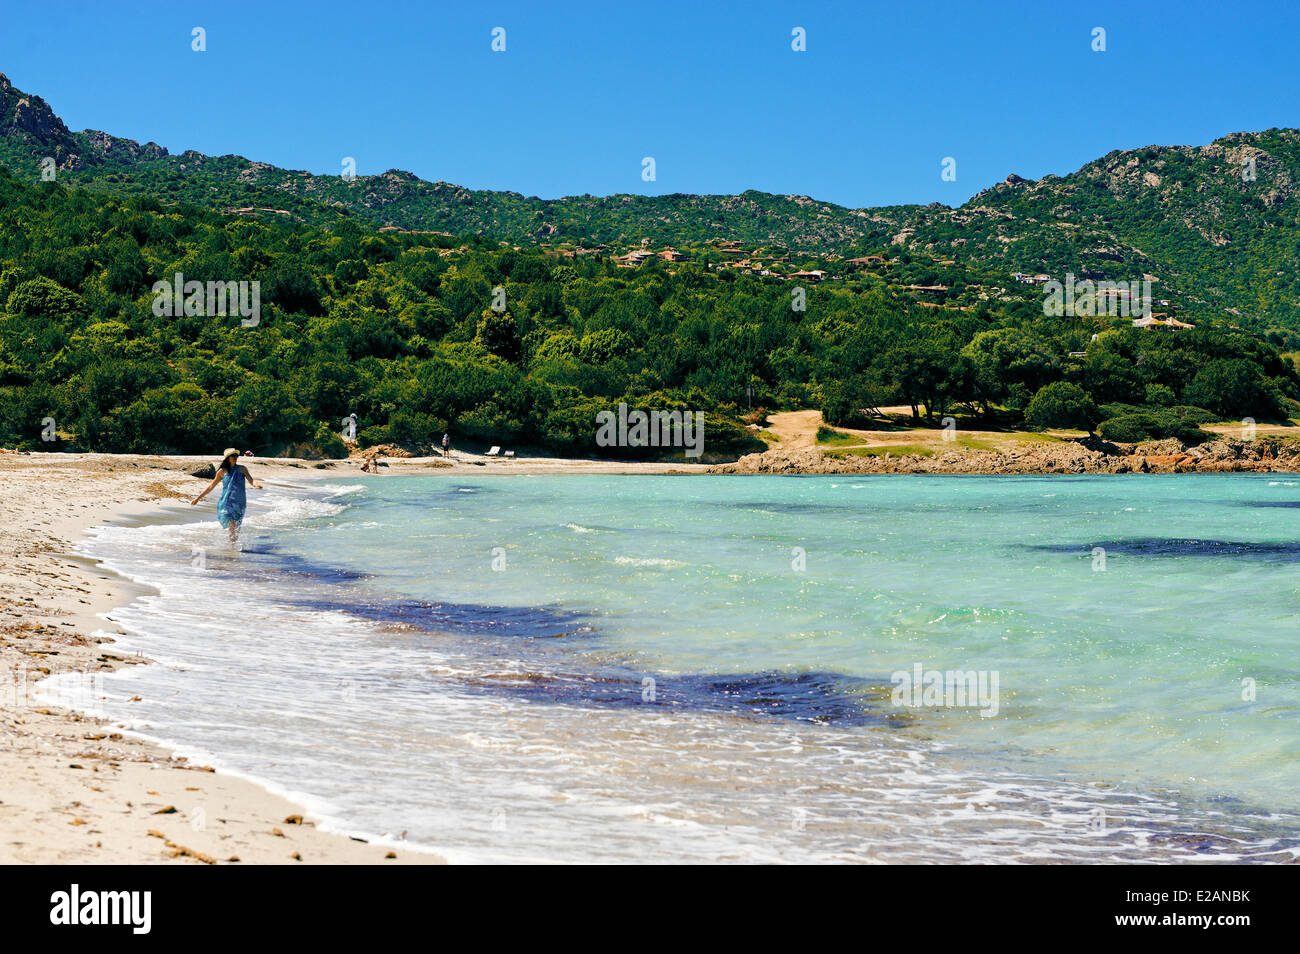 Italy, Sardinia, Olbia Tempio Province, the Emerald Coast (Costa Smeralda), Porto Cervo, Pevero beach, young woman Stock Photo